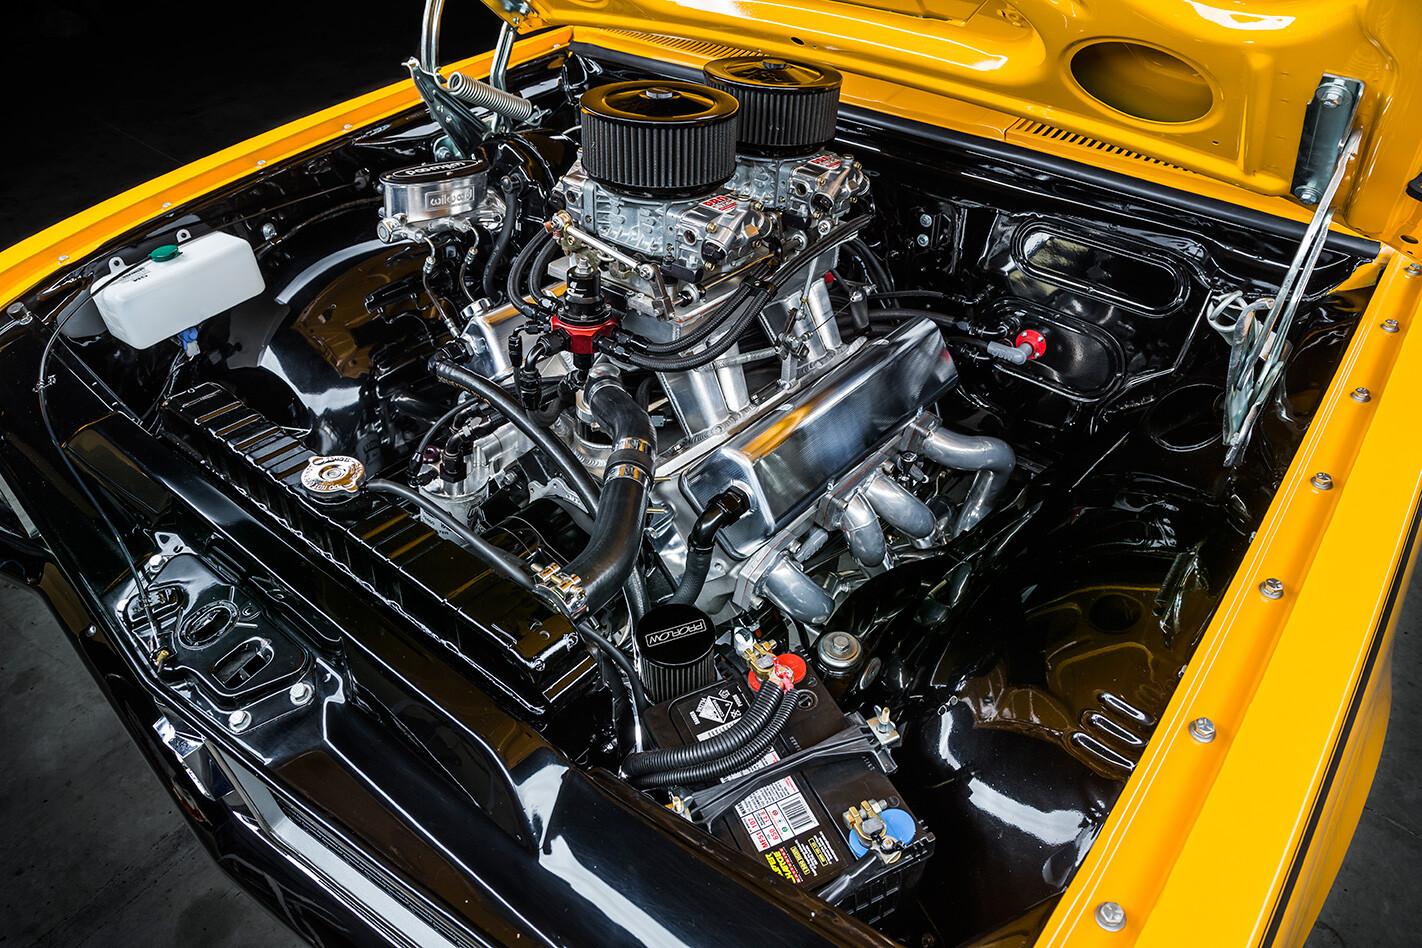 1970-Holden-HG-GTS-Monaro-engine-bay